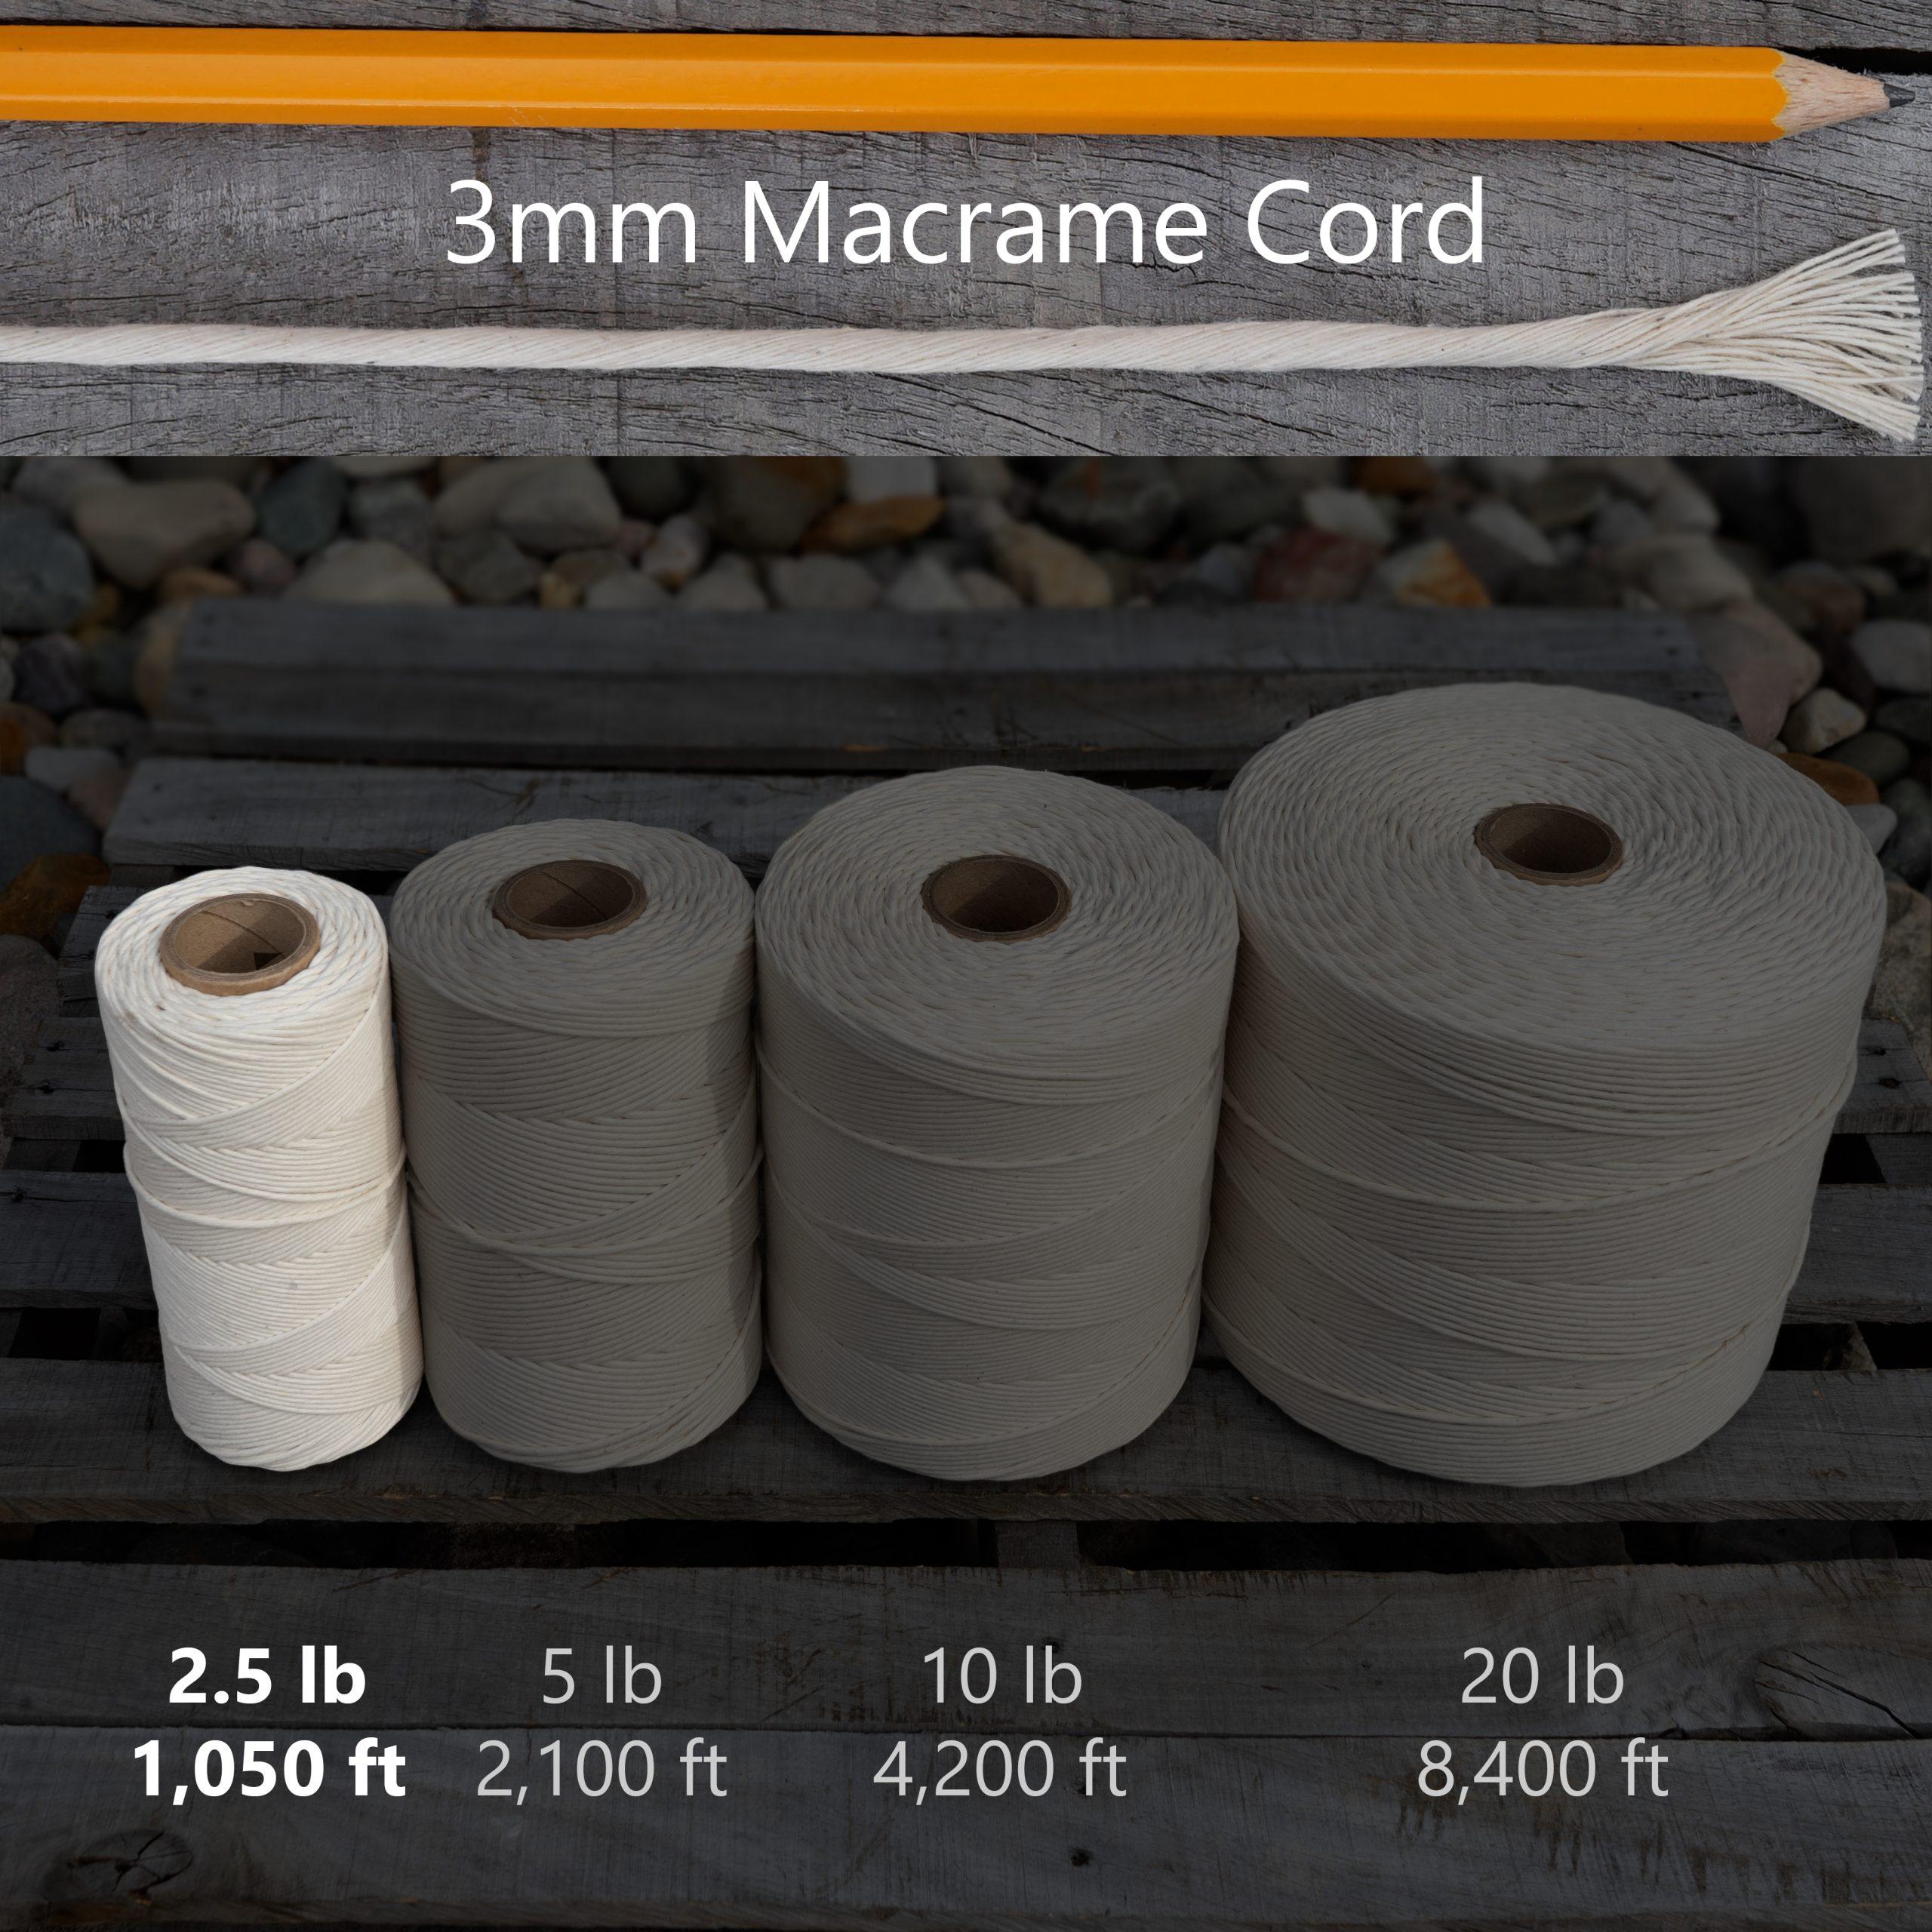 3 mm x 2.5 lb macrame tube